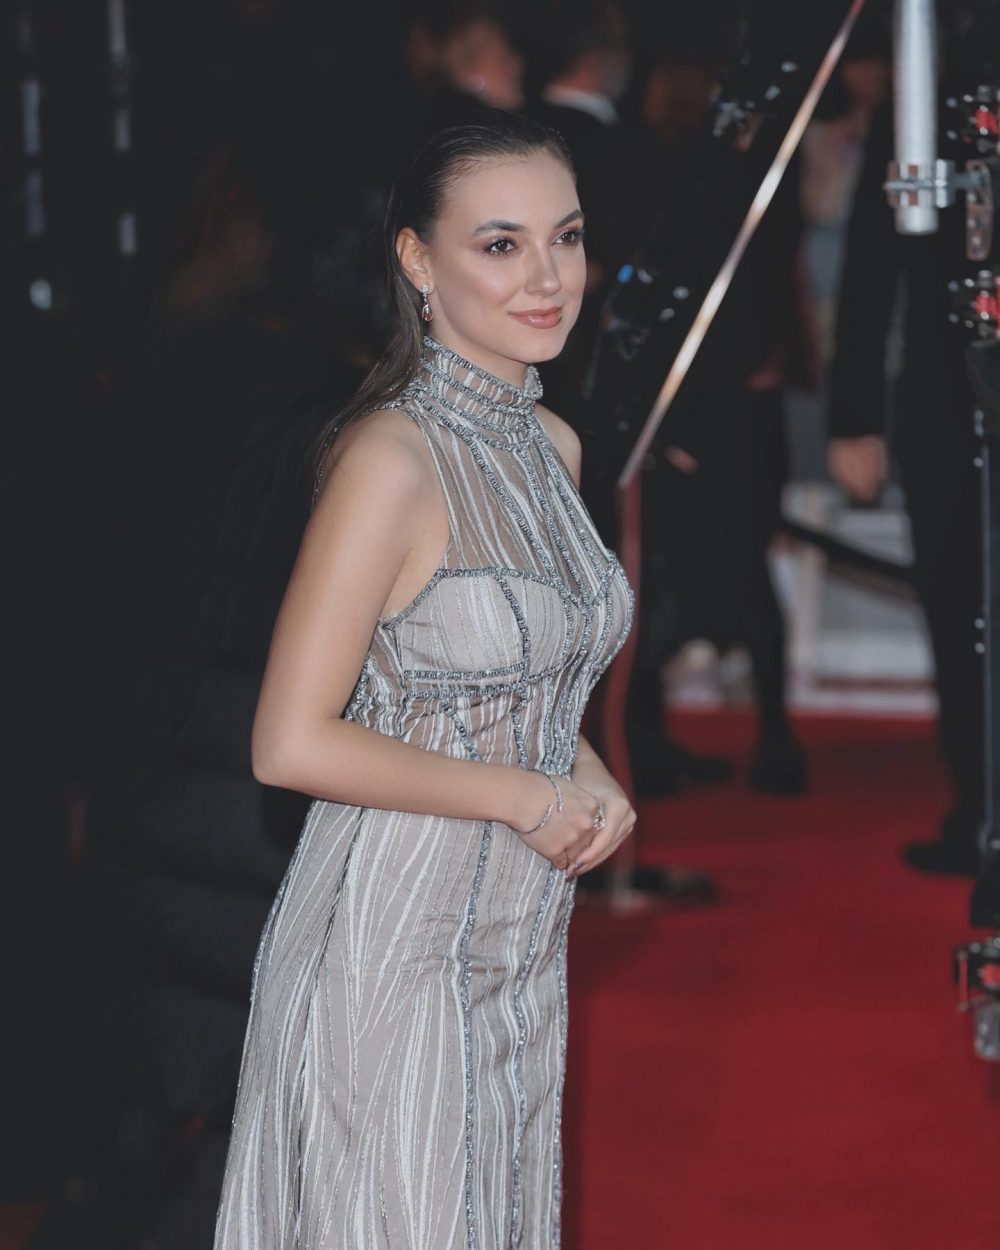 Andreea Cristea | Andreea Cristea Red Carpet Look | Andreea Cristea BAFTA 2020